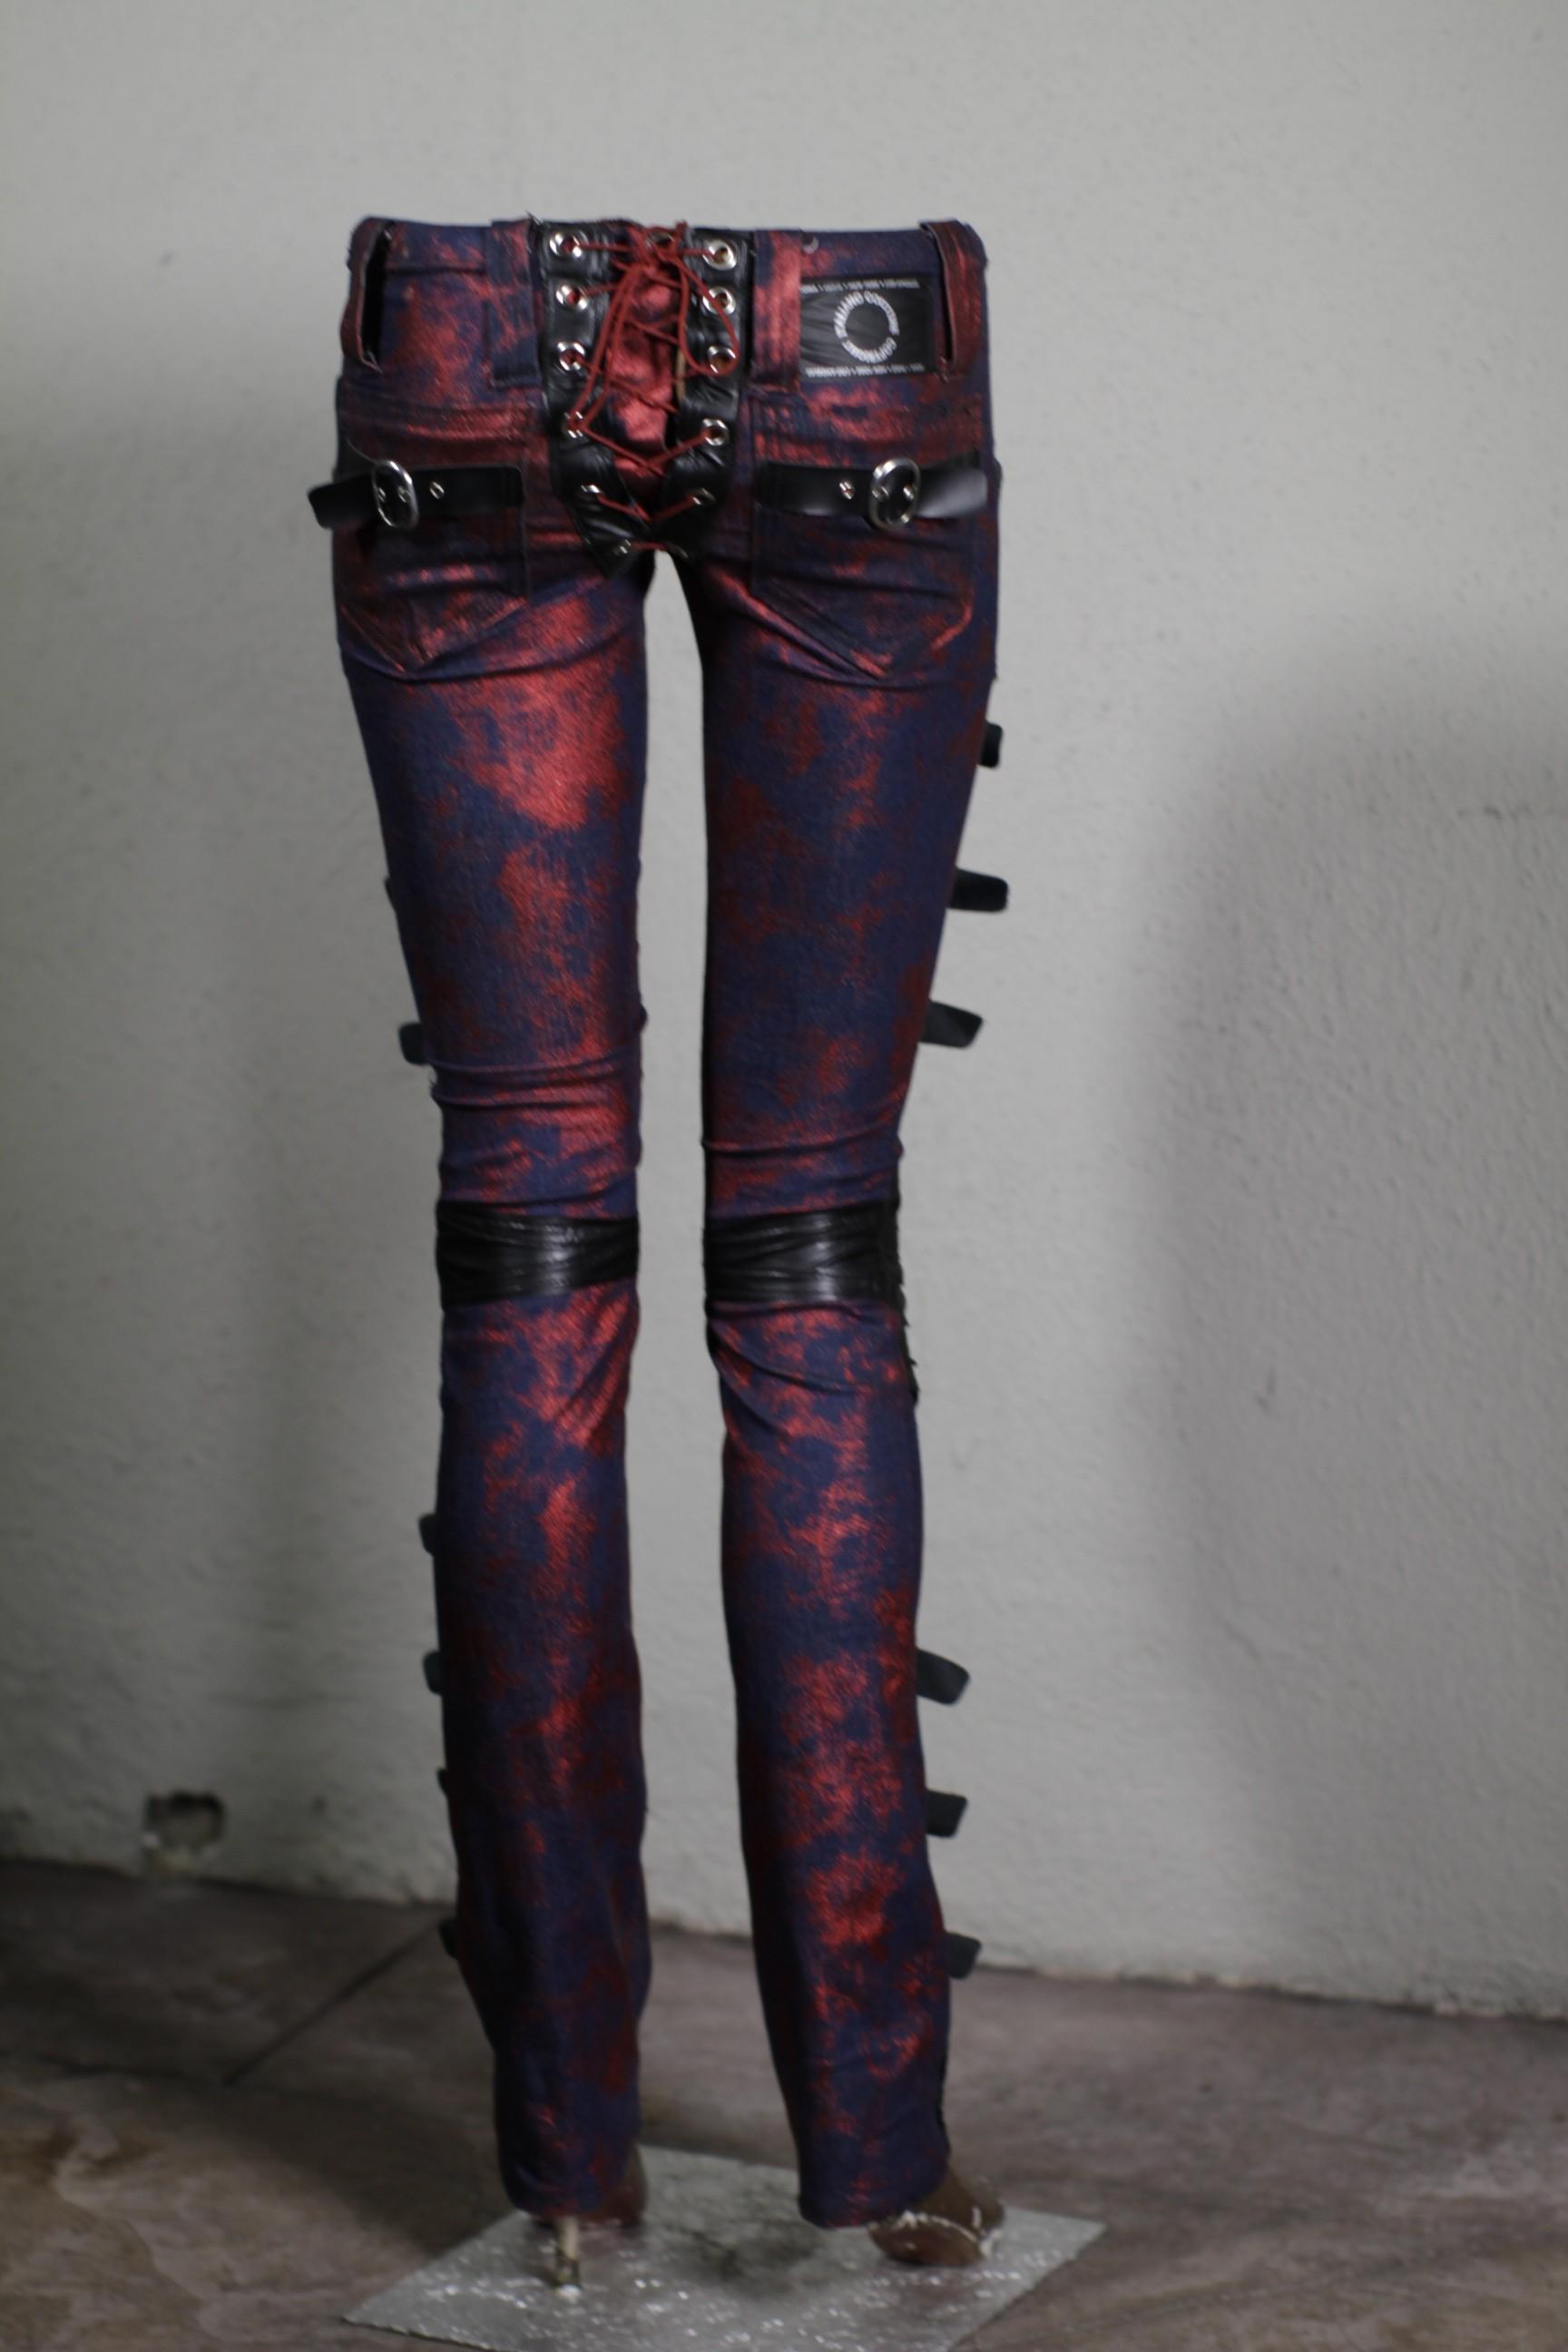 rocker_buckle_lace_up_pants_pants_and_jeans_7.JPG